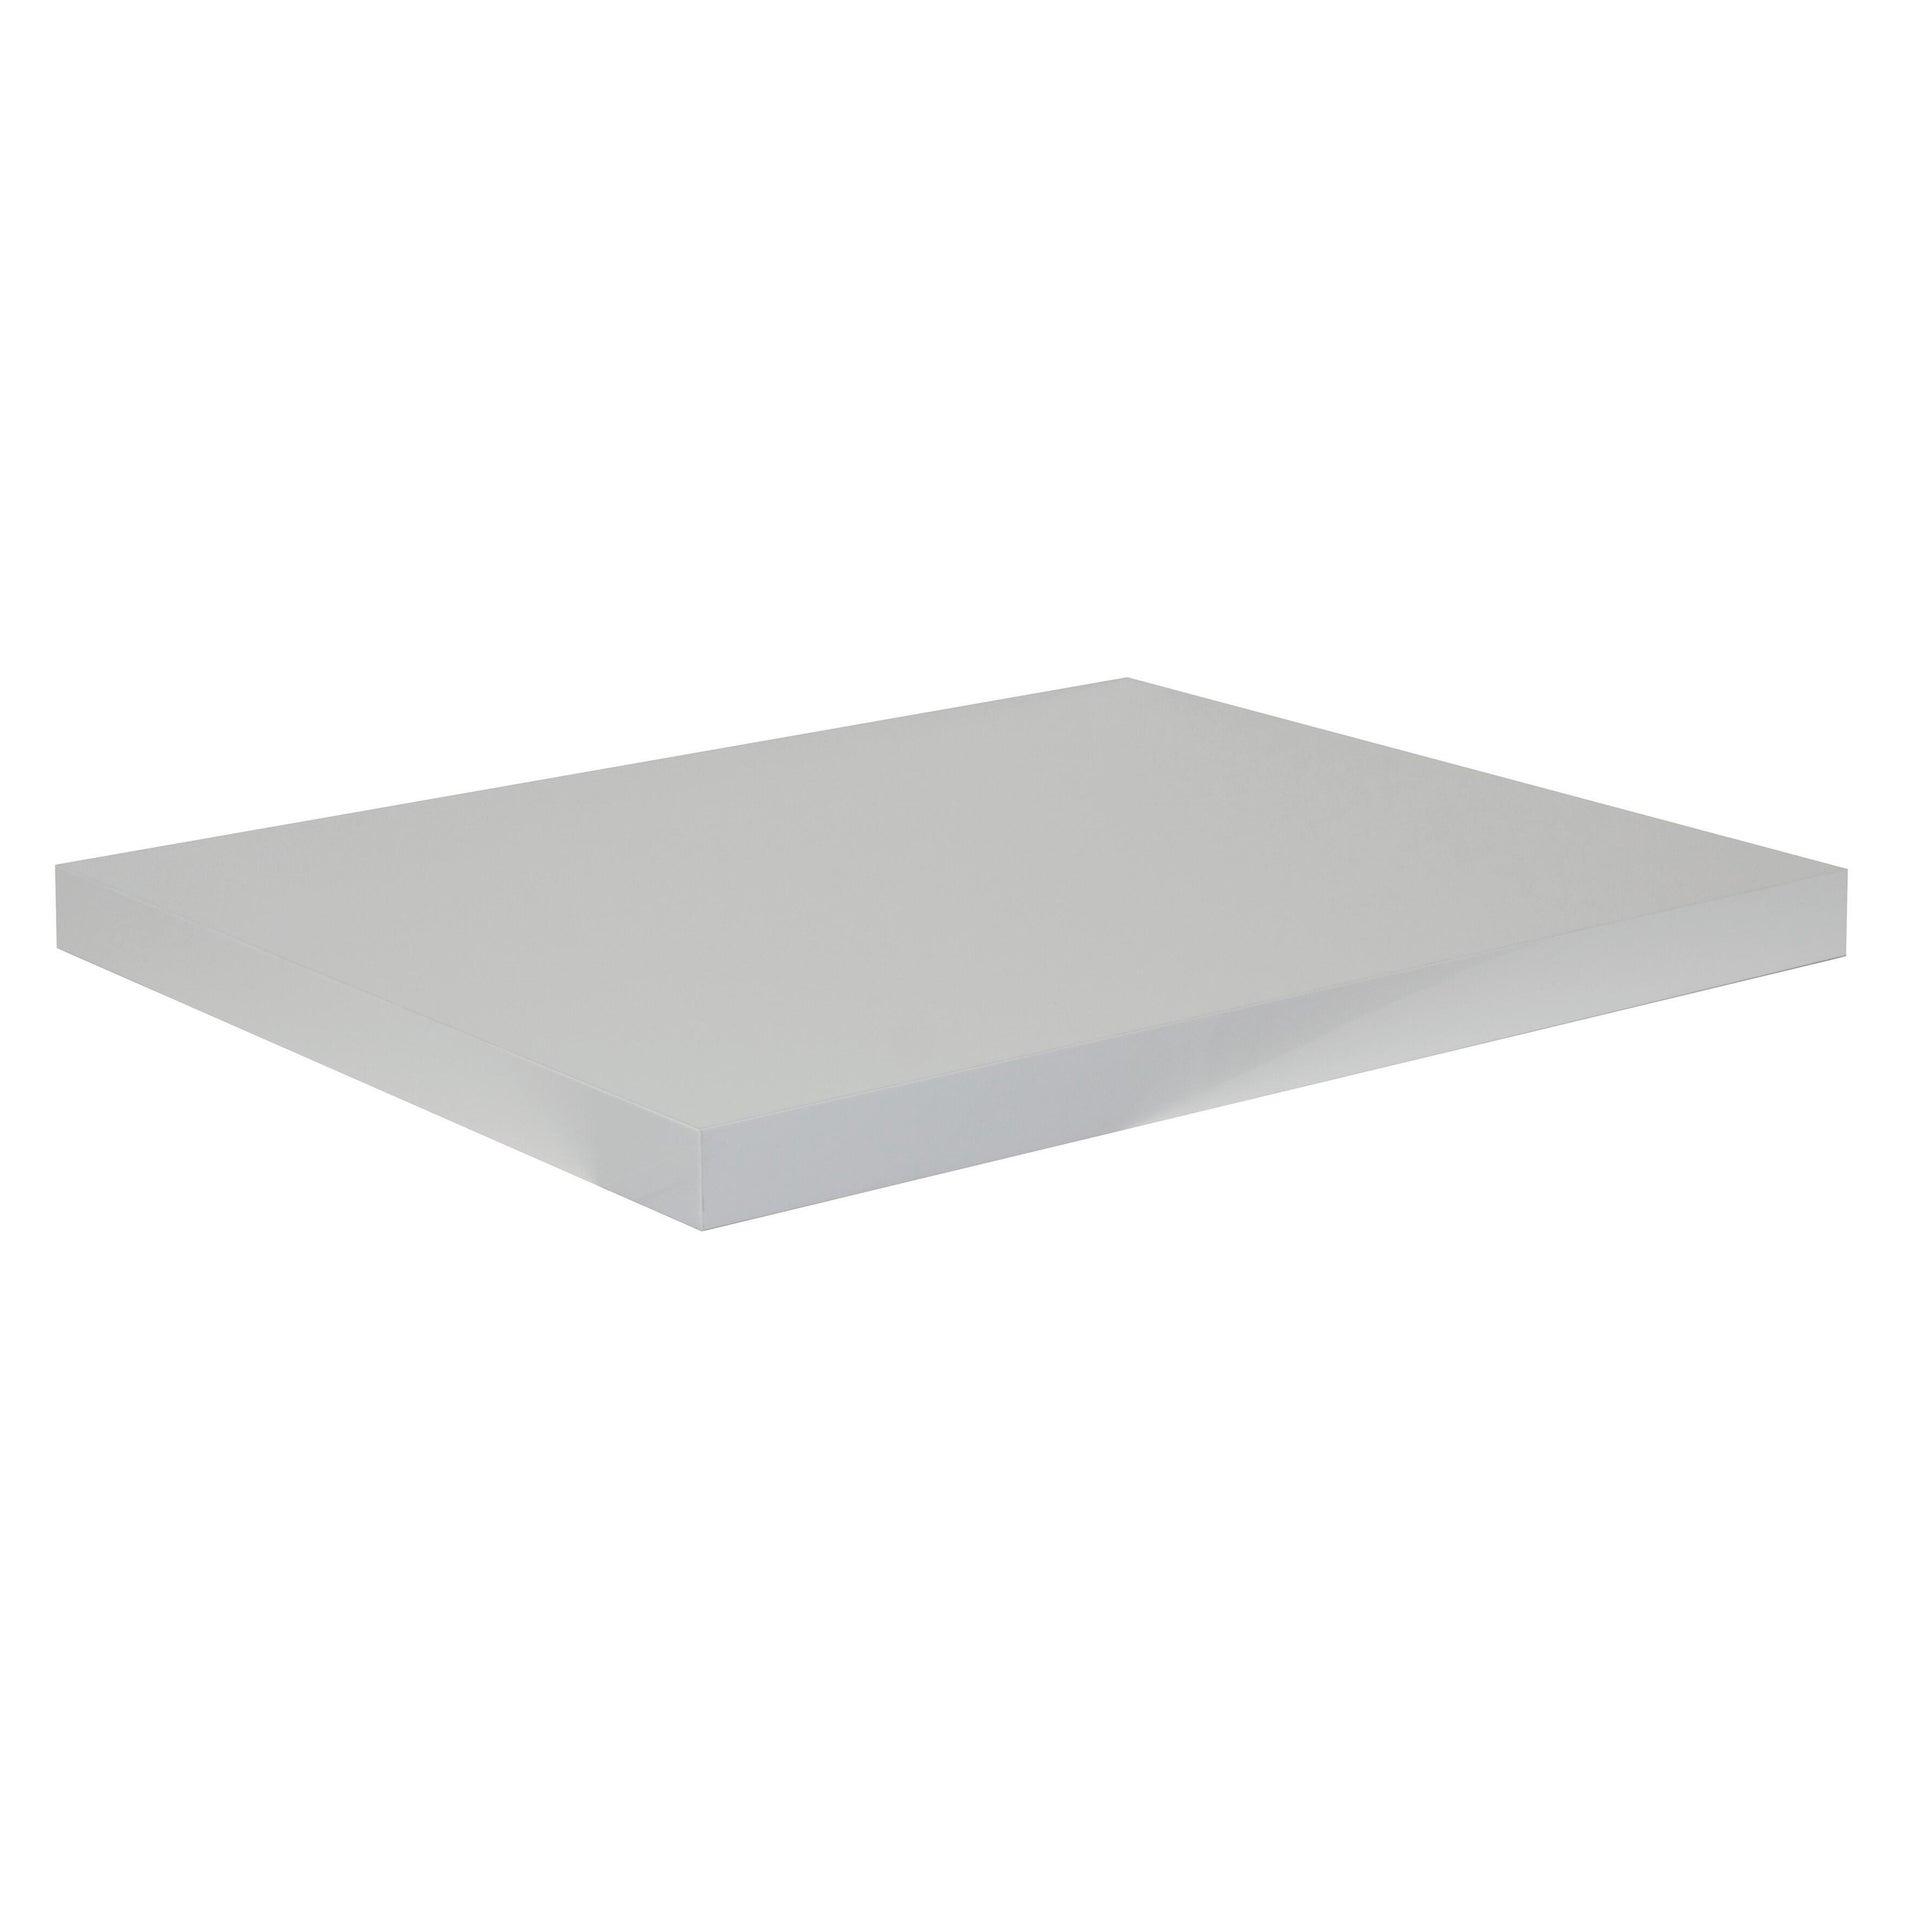 Top per lavabo SENSEA Remix L 90 x P 49 x H 3.8 cm lucido - 2